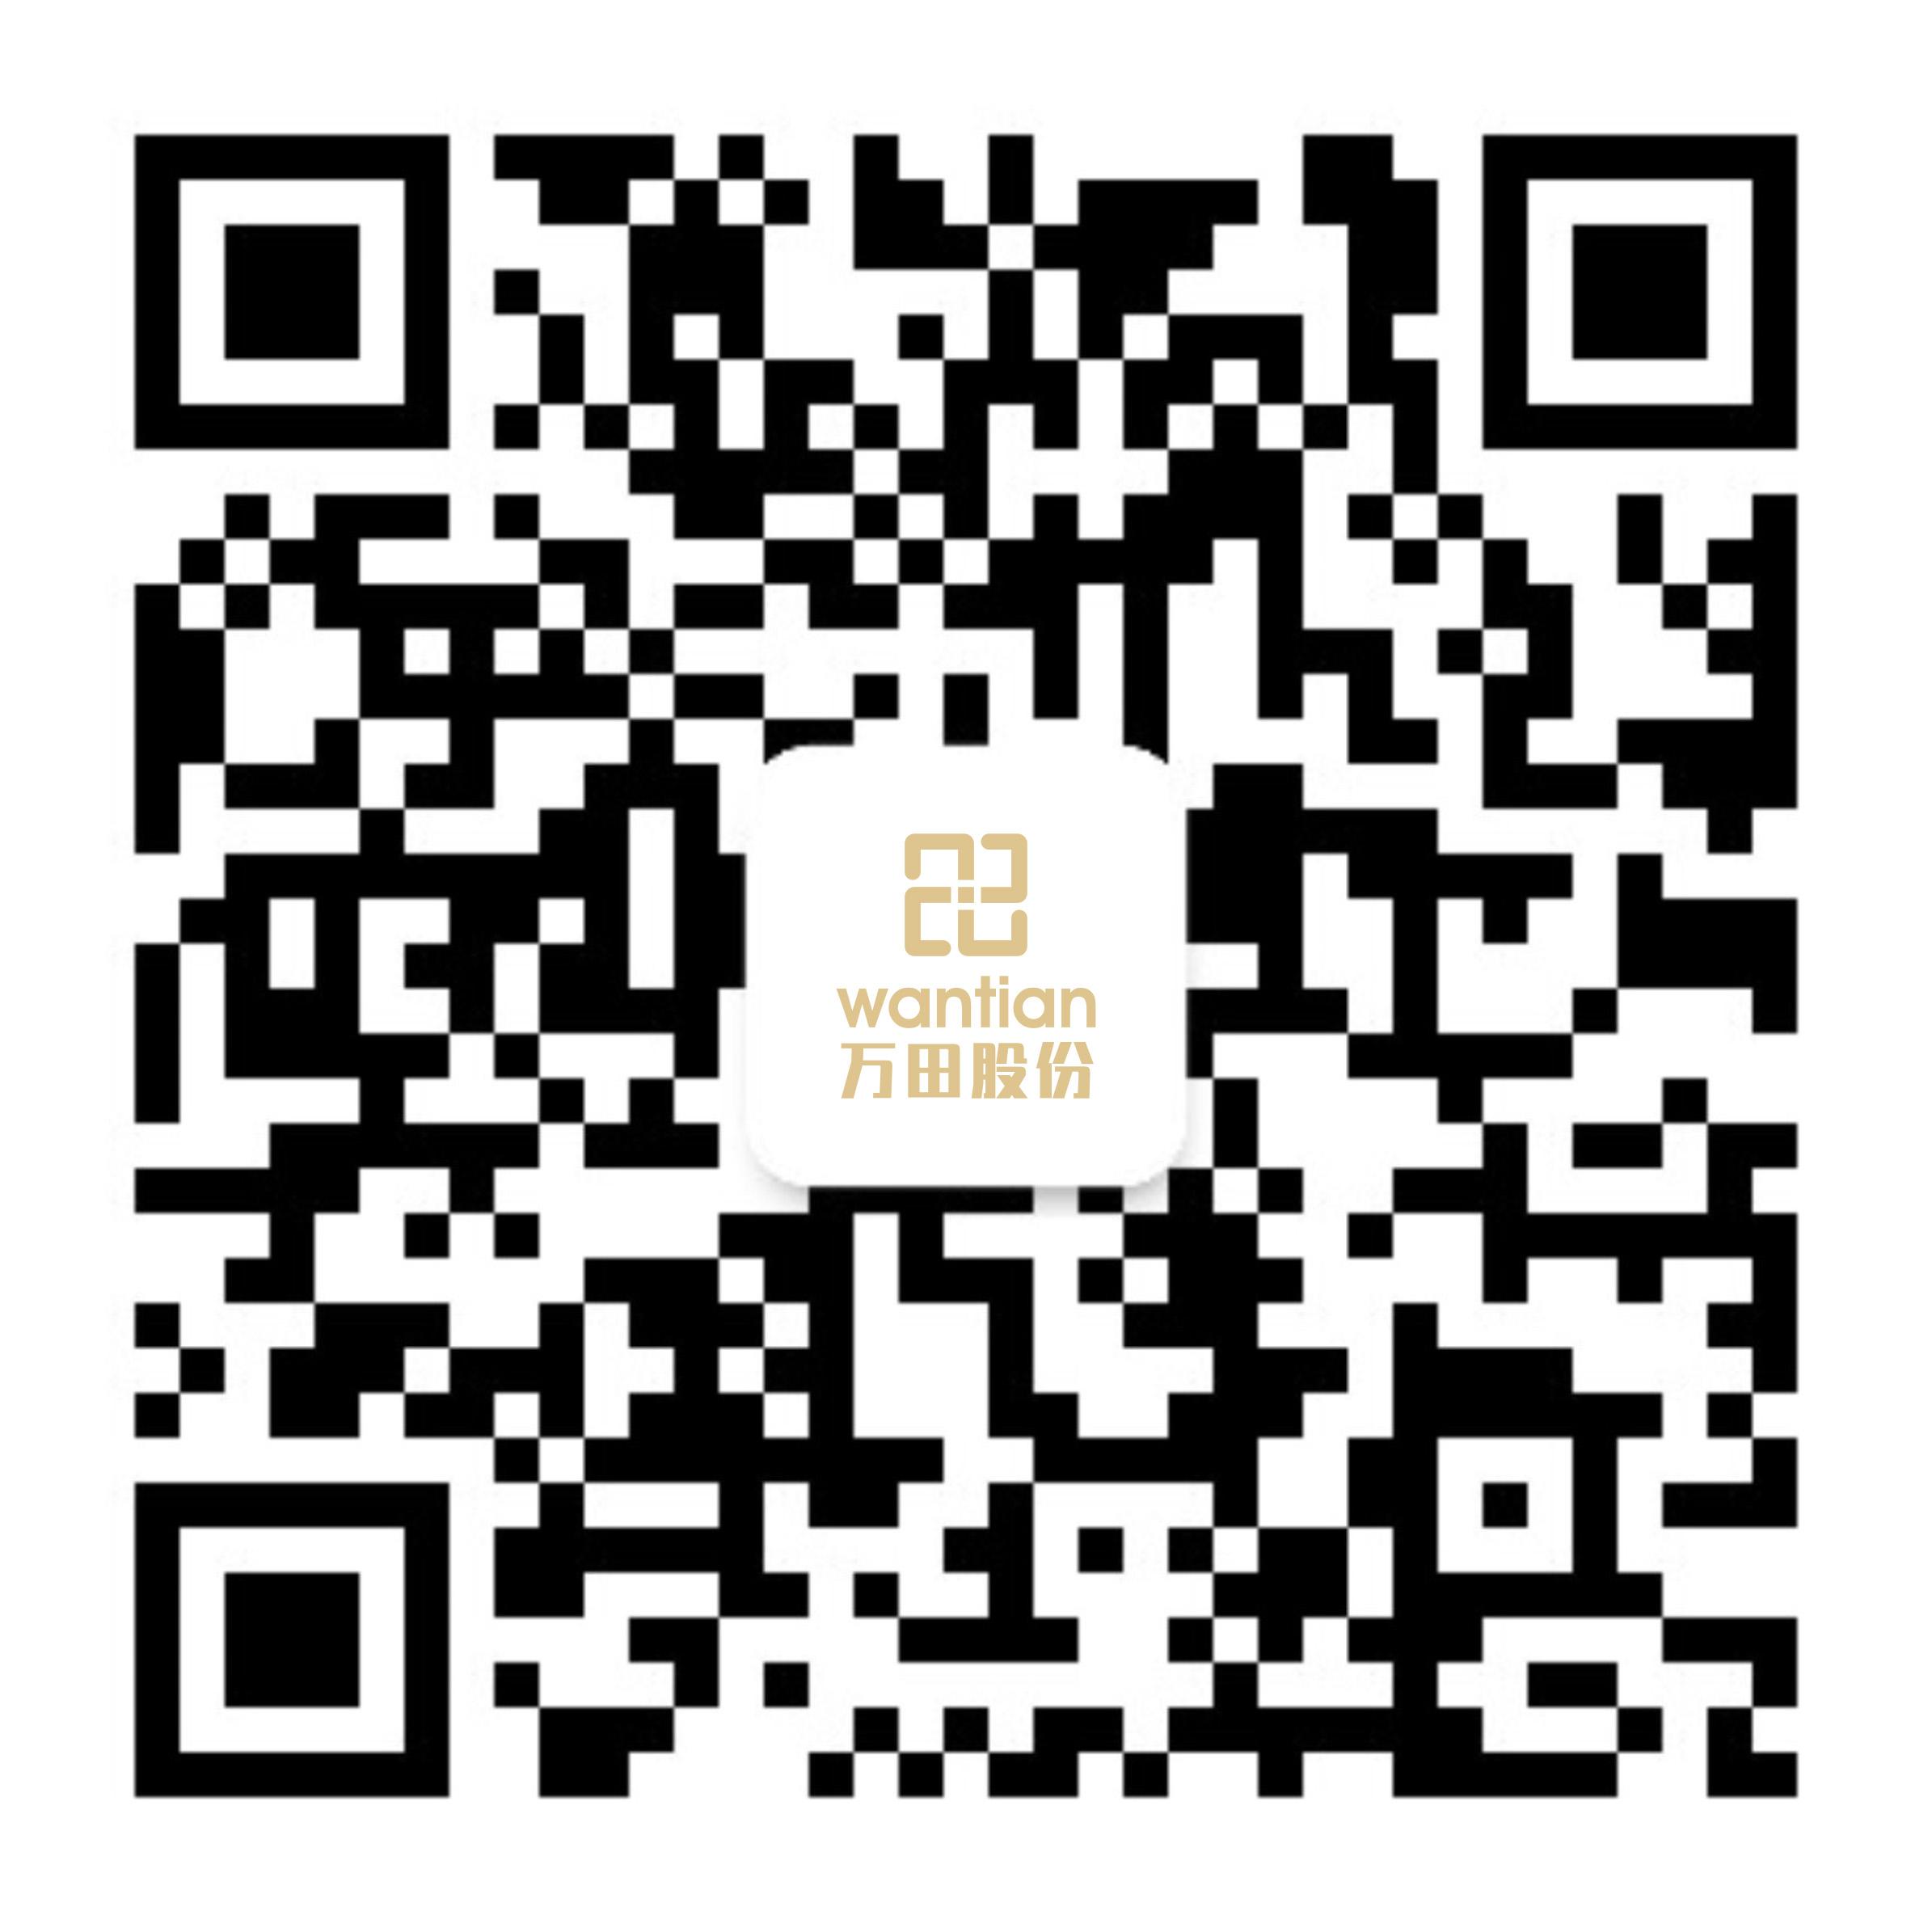 opebet官方网站园林二维码拷贝